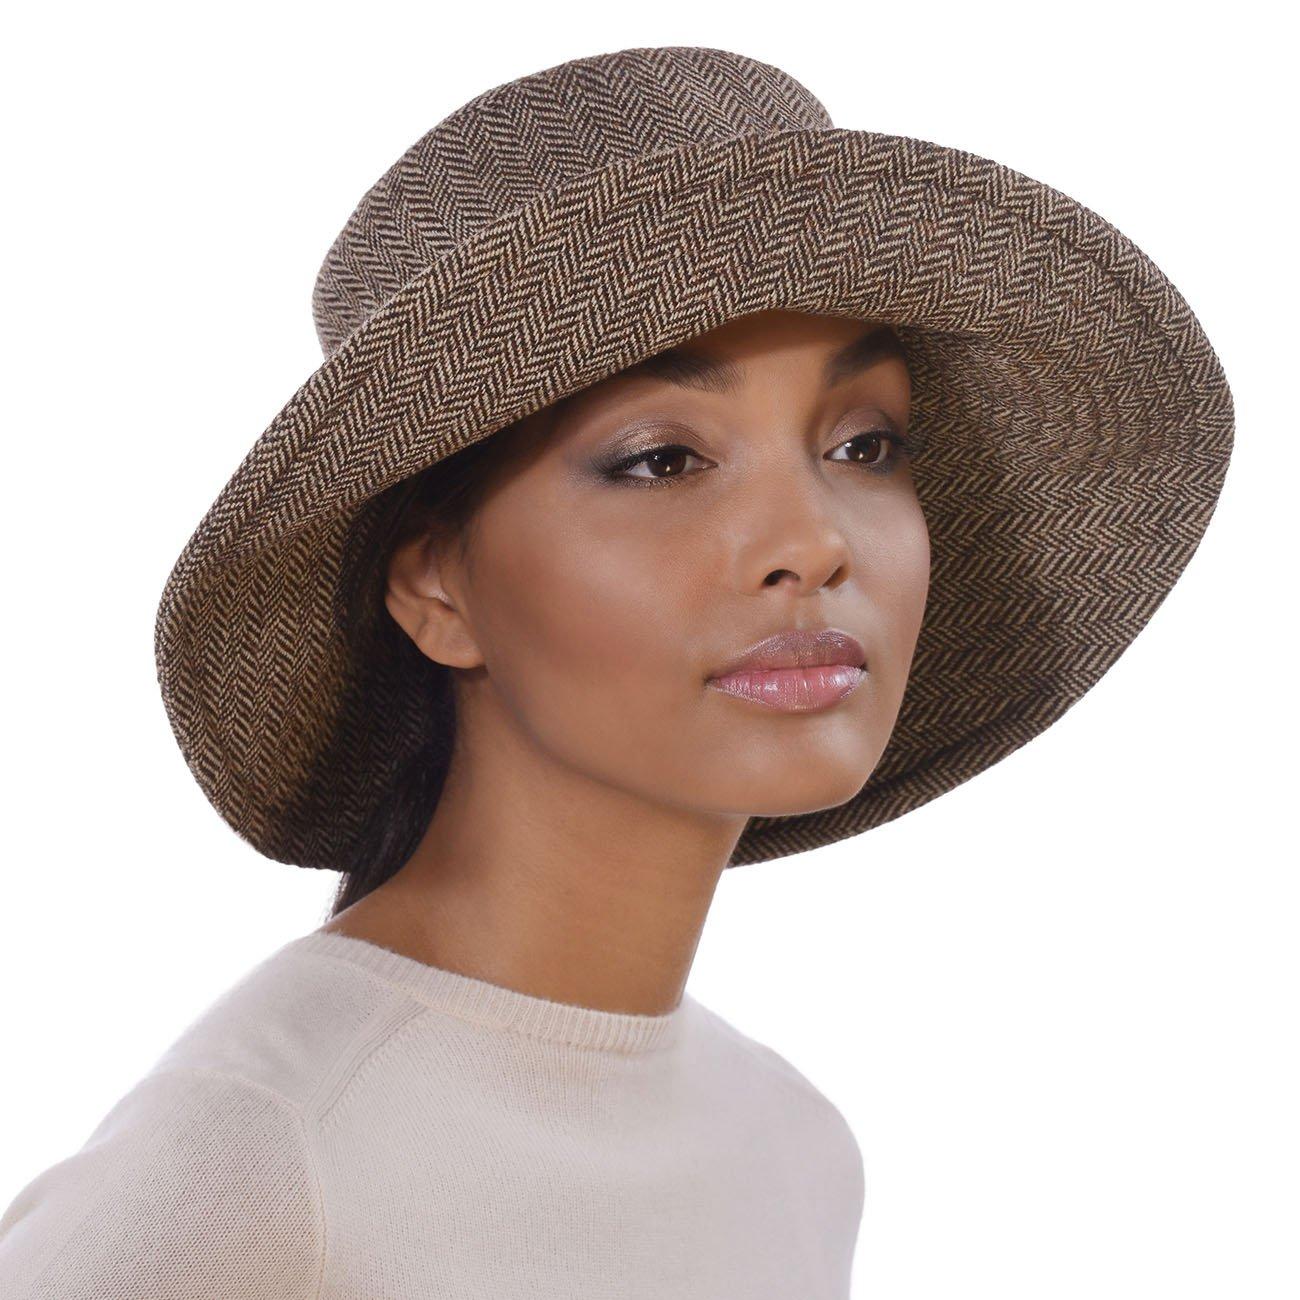 Eric Javits Designer Women's Luxury Headwear - Tweed Floppy Brown Mix